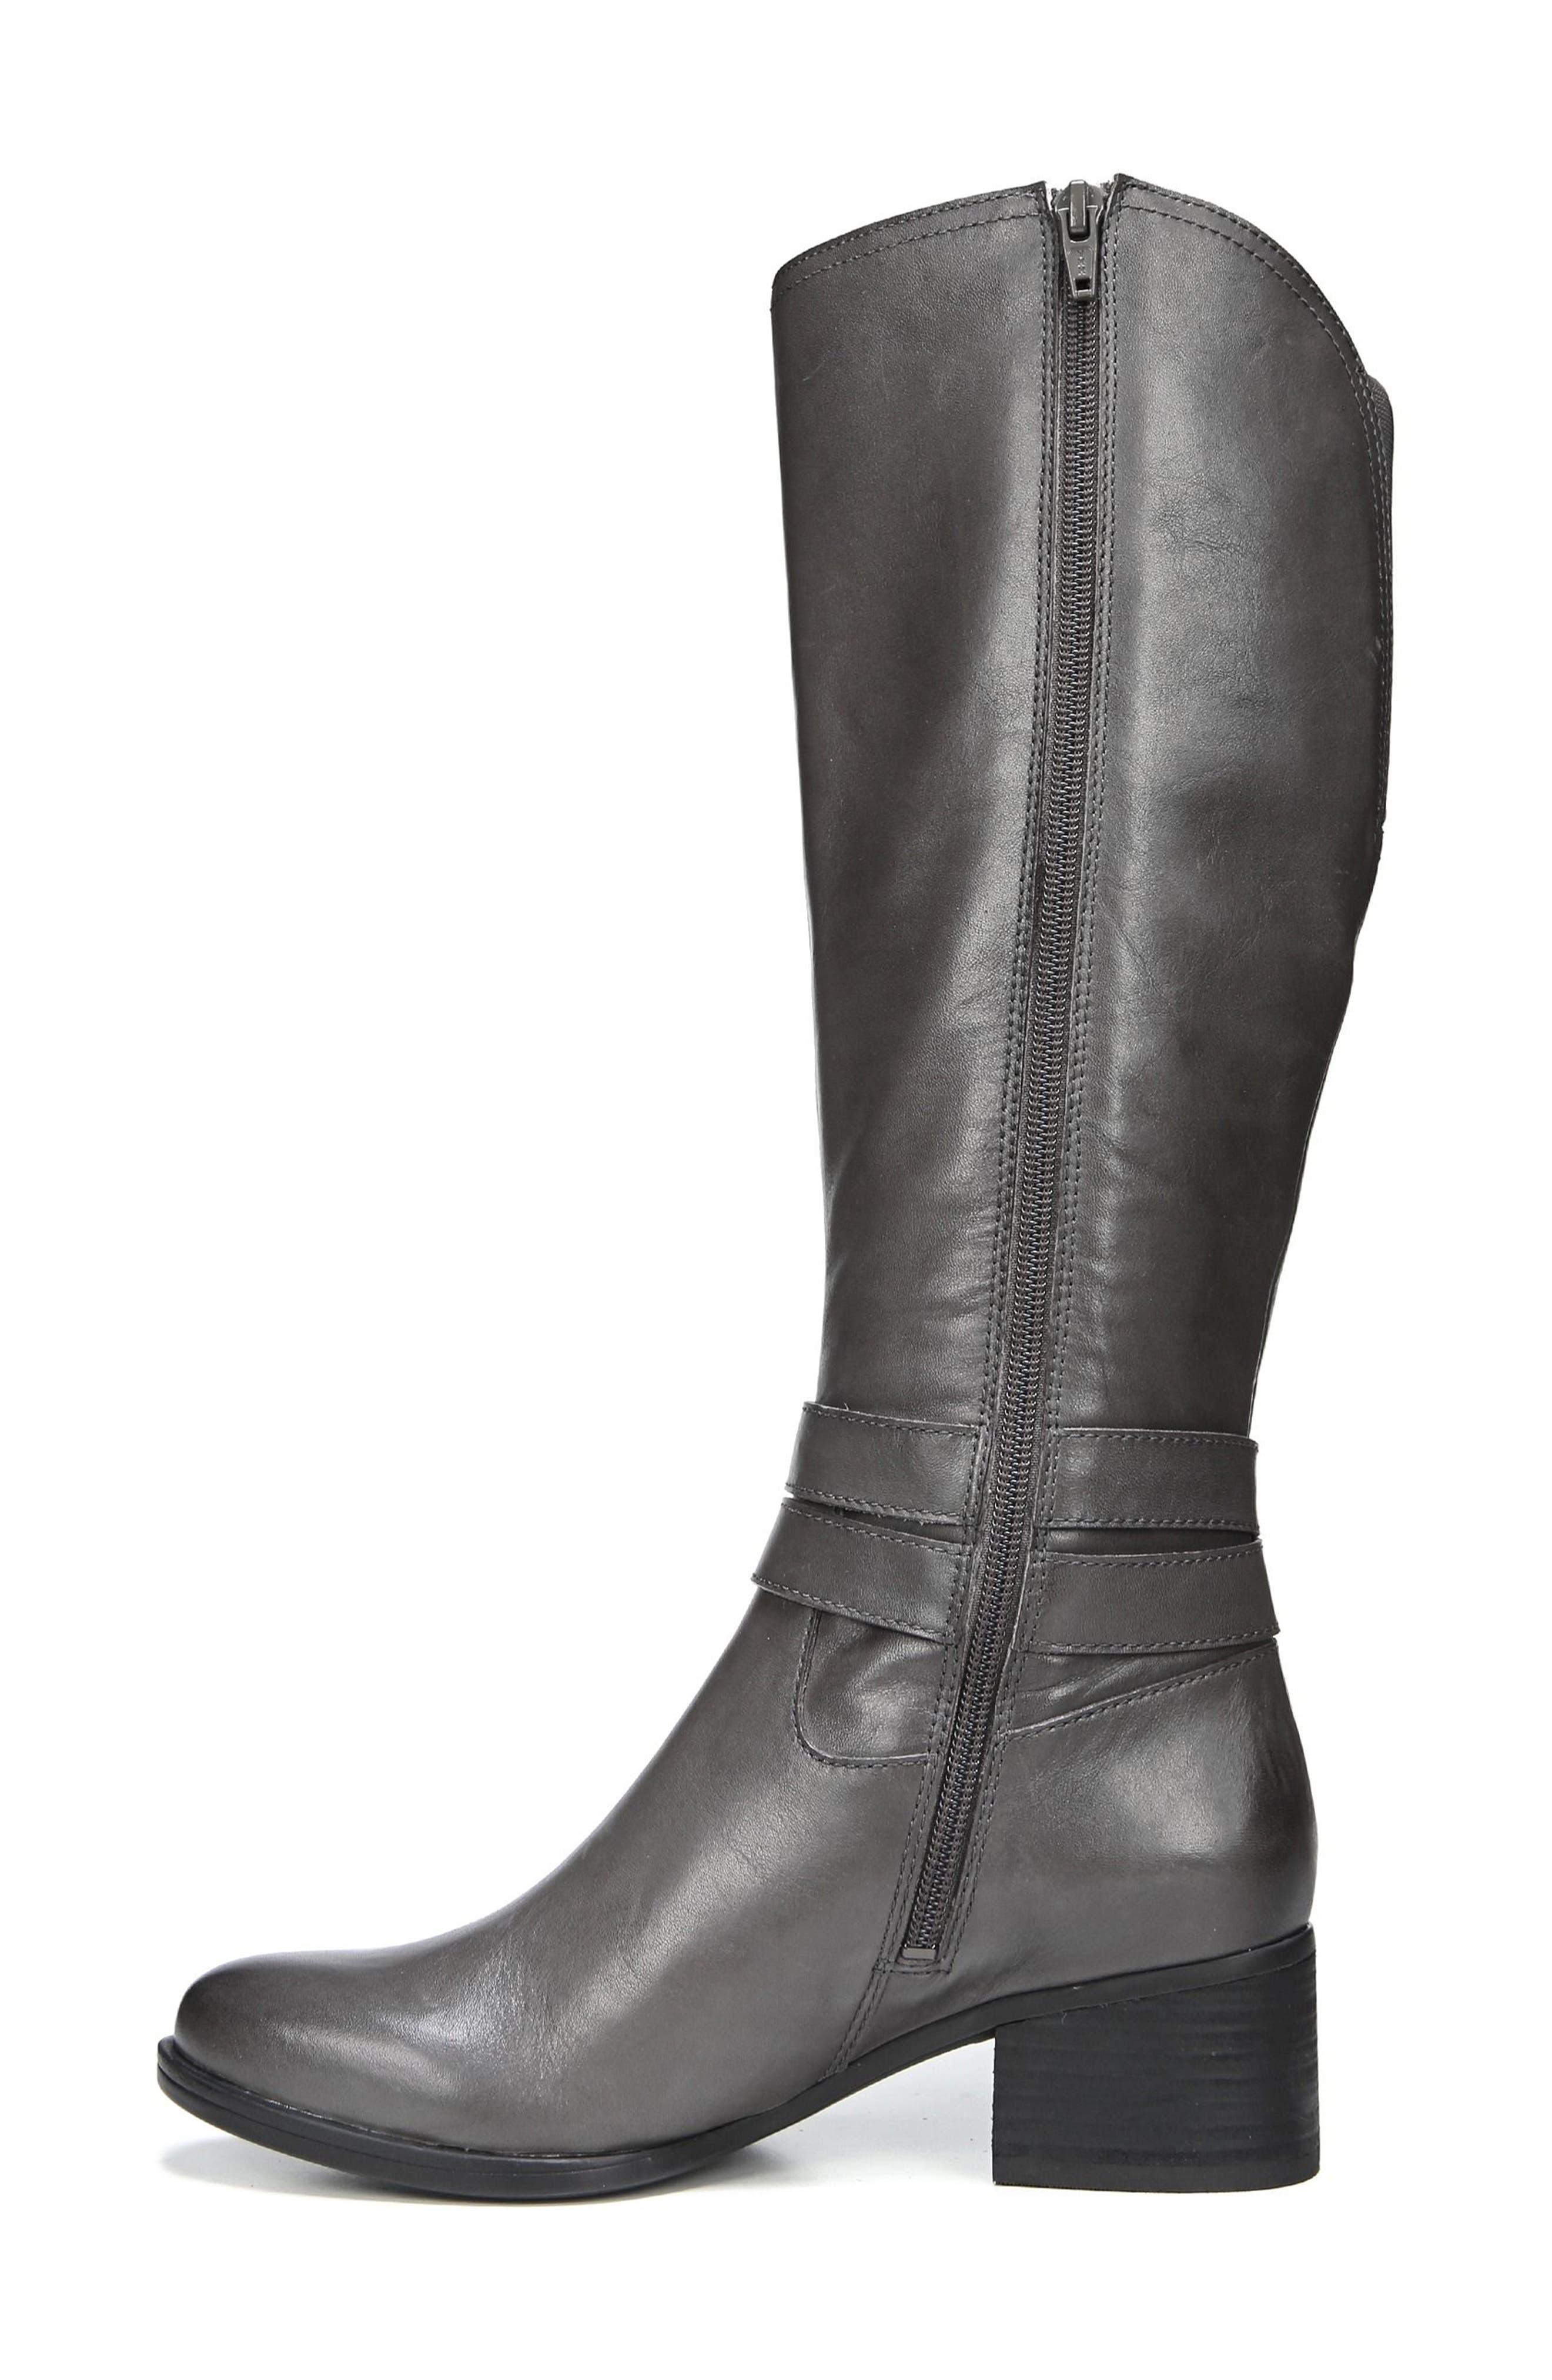 Alternate Image 2  - Naturalizer Dev Buckle Strap Boot (Women) (Regular & Wide Calf)